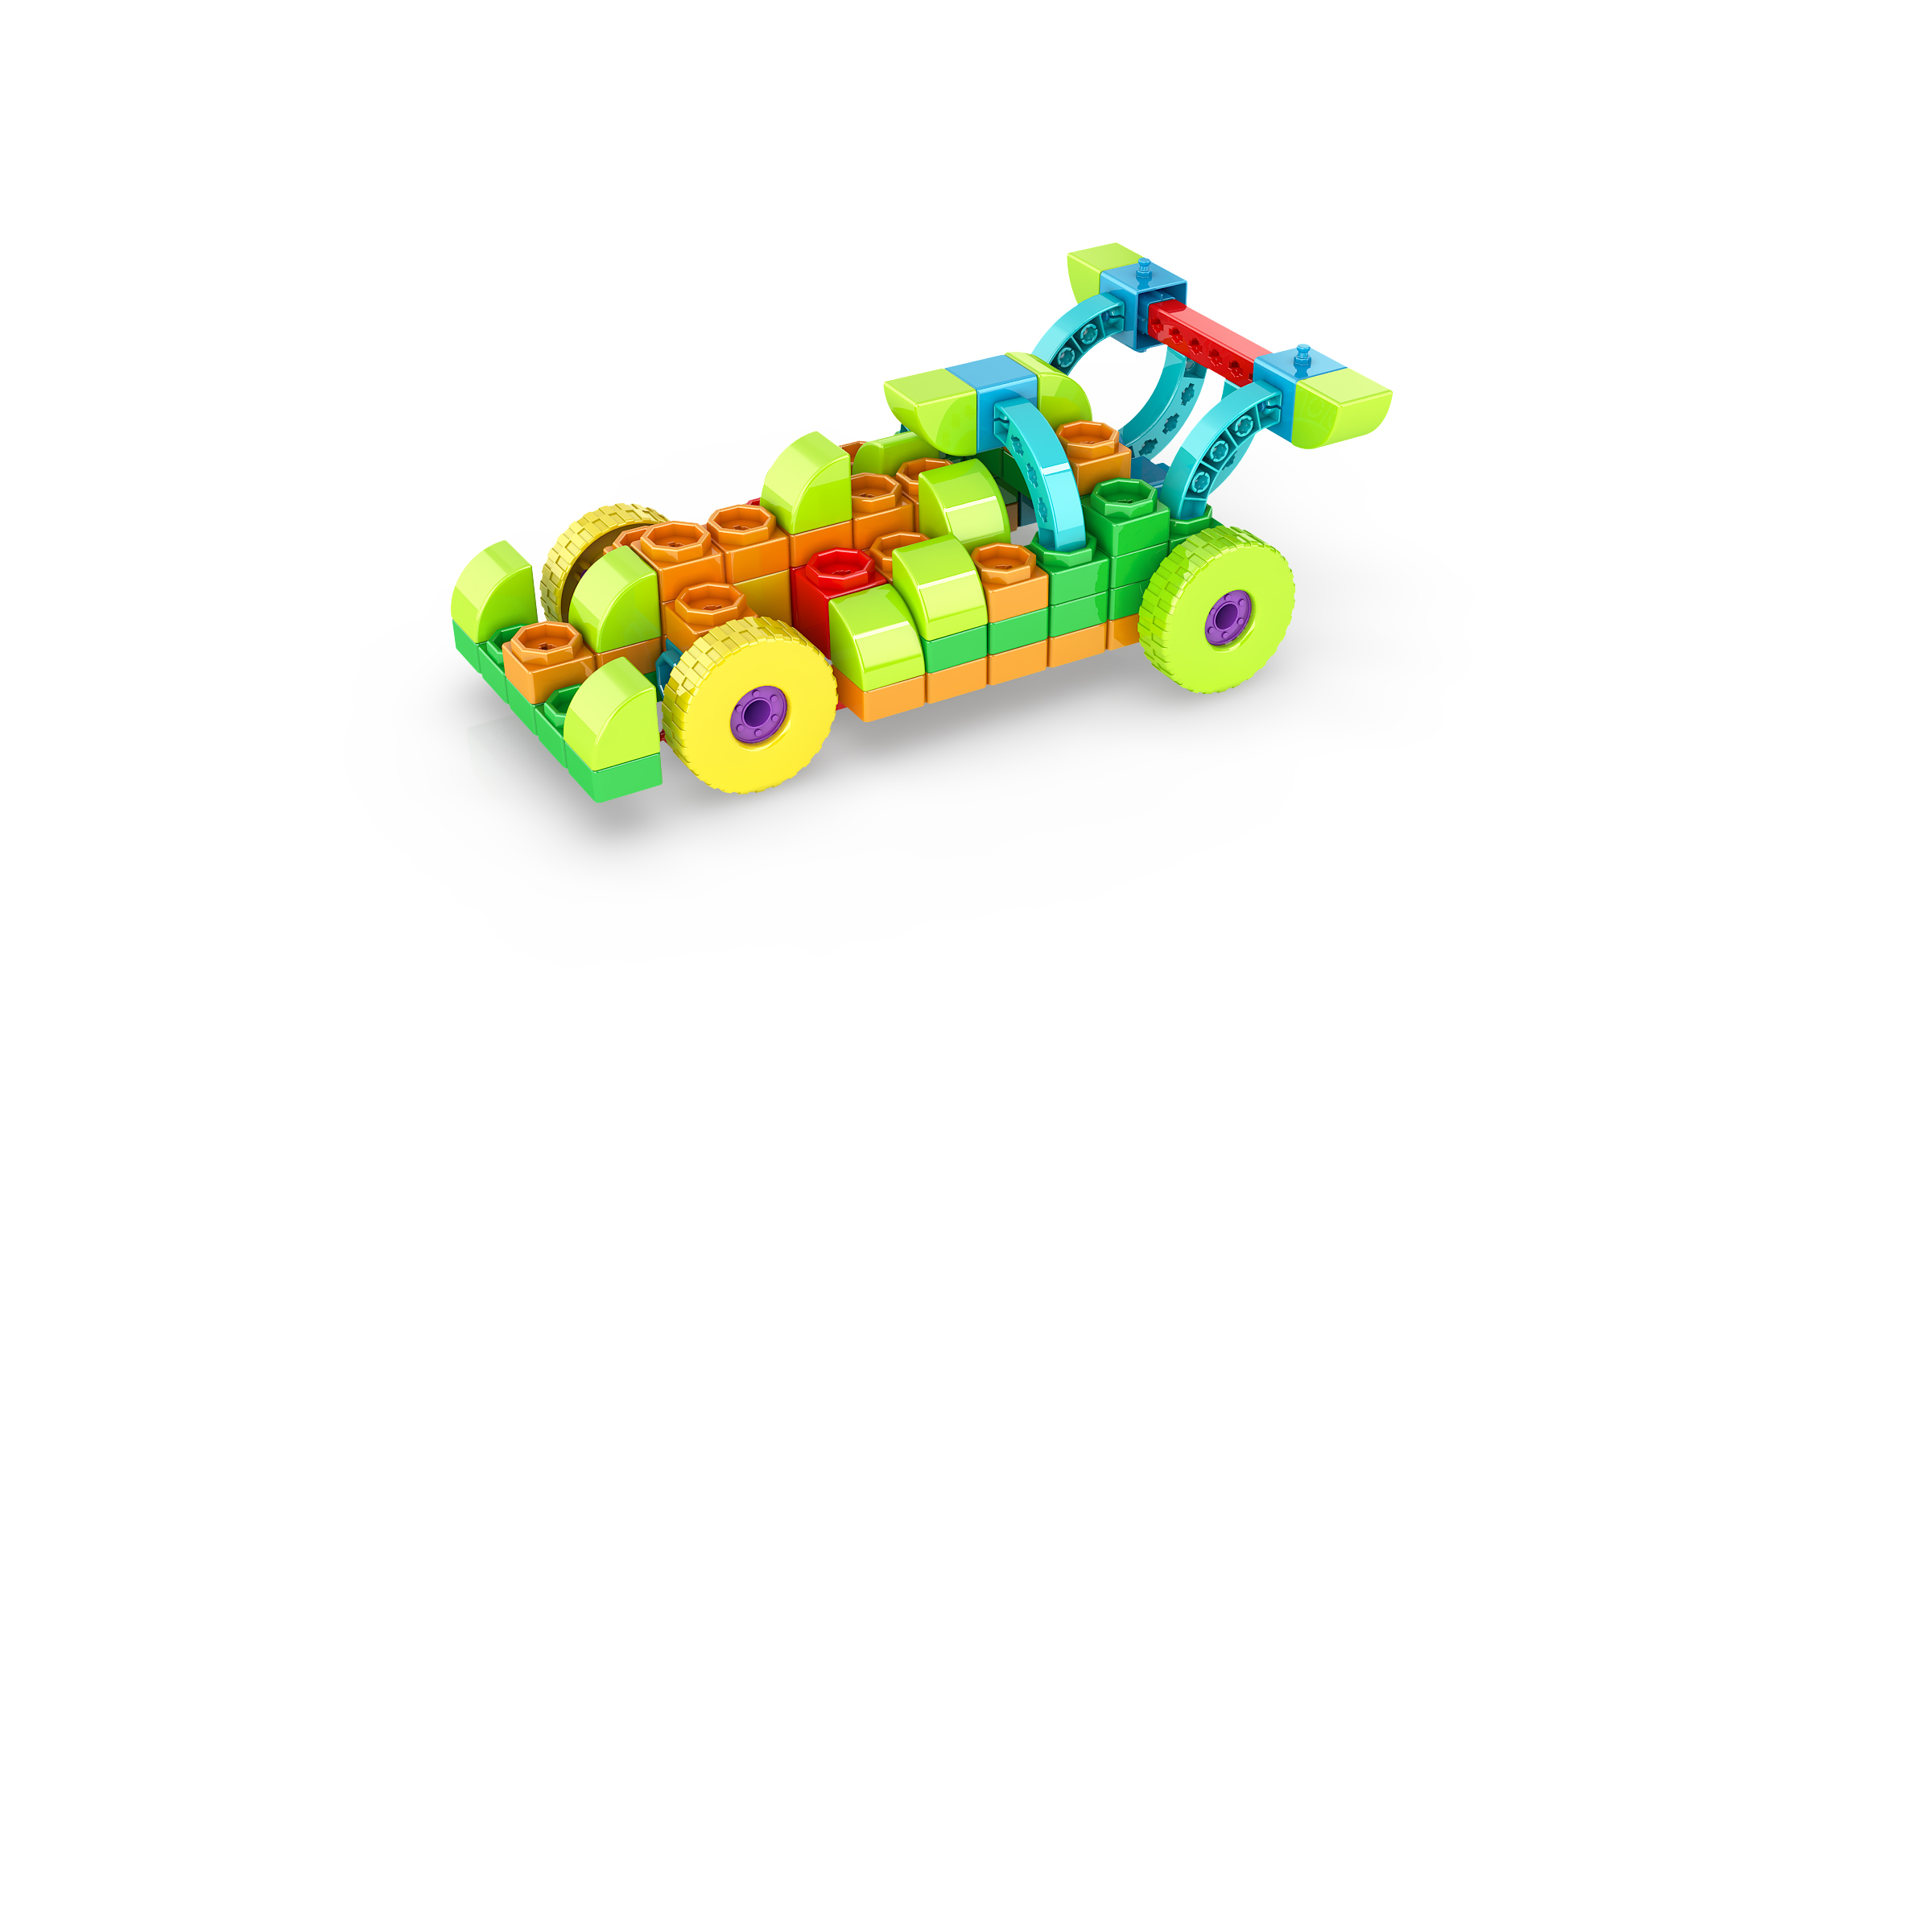 , 1 FORMULA RACER 1, משחקי חשיבה לילדים engino, משחקים לגיל הרך playgro, משחק הרכבות אנג'ינו, משחקי רכבות